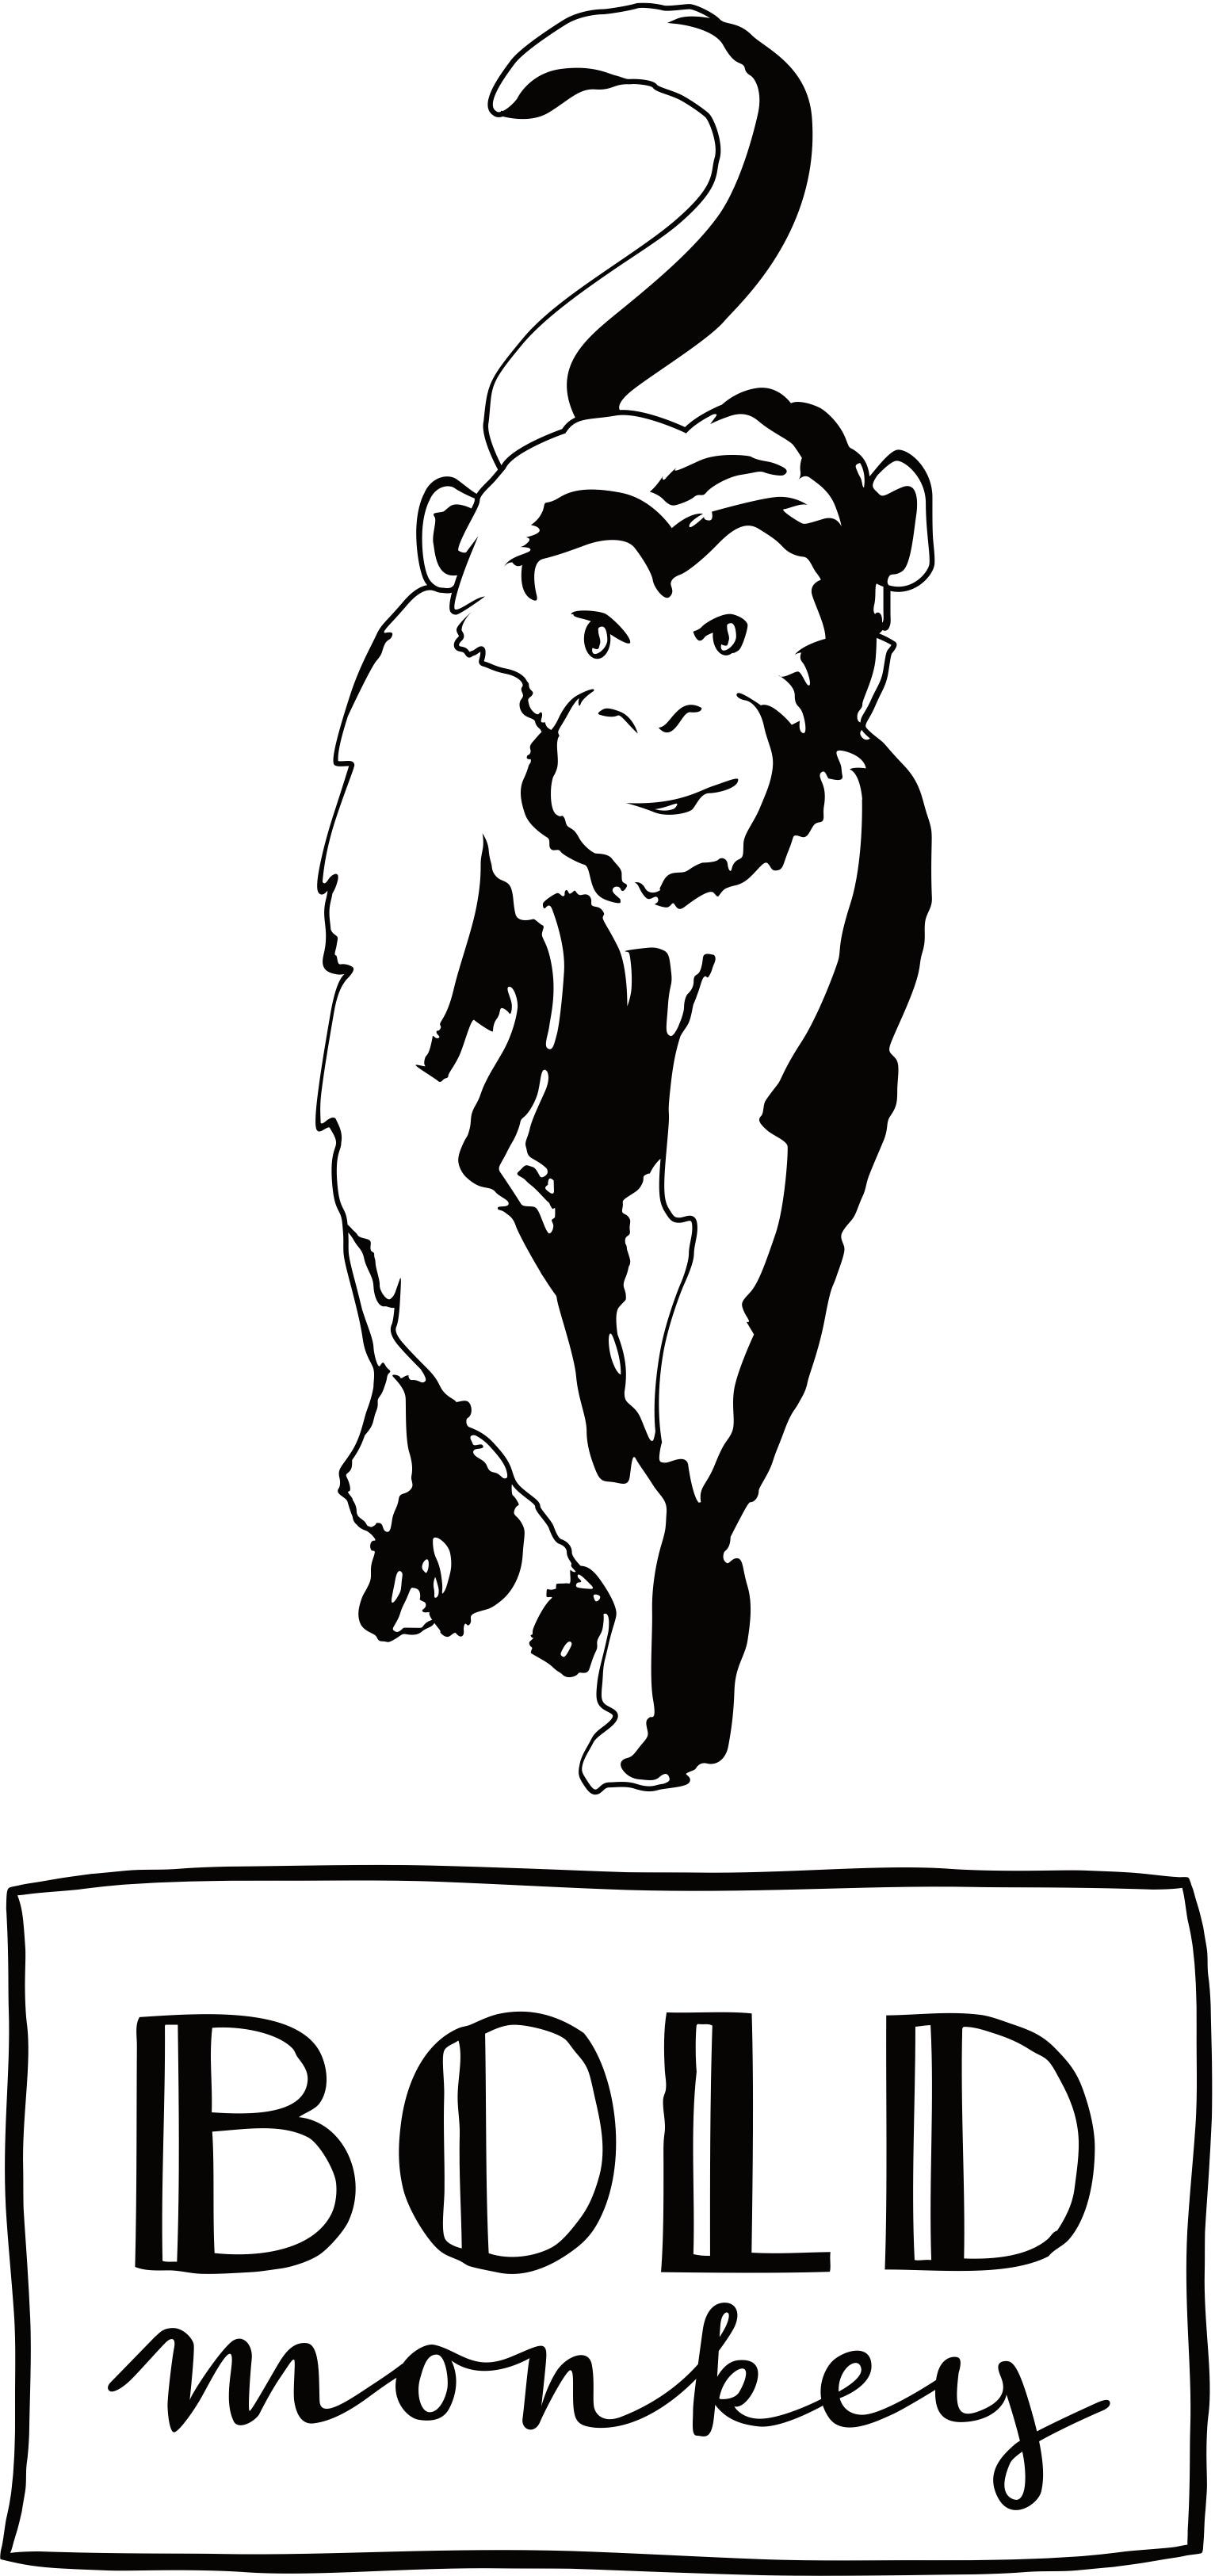 Bold Monkey I am not a croissant bank roze velvet gouden poten vooraanzicht